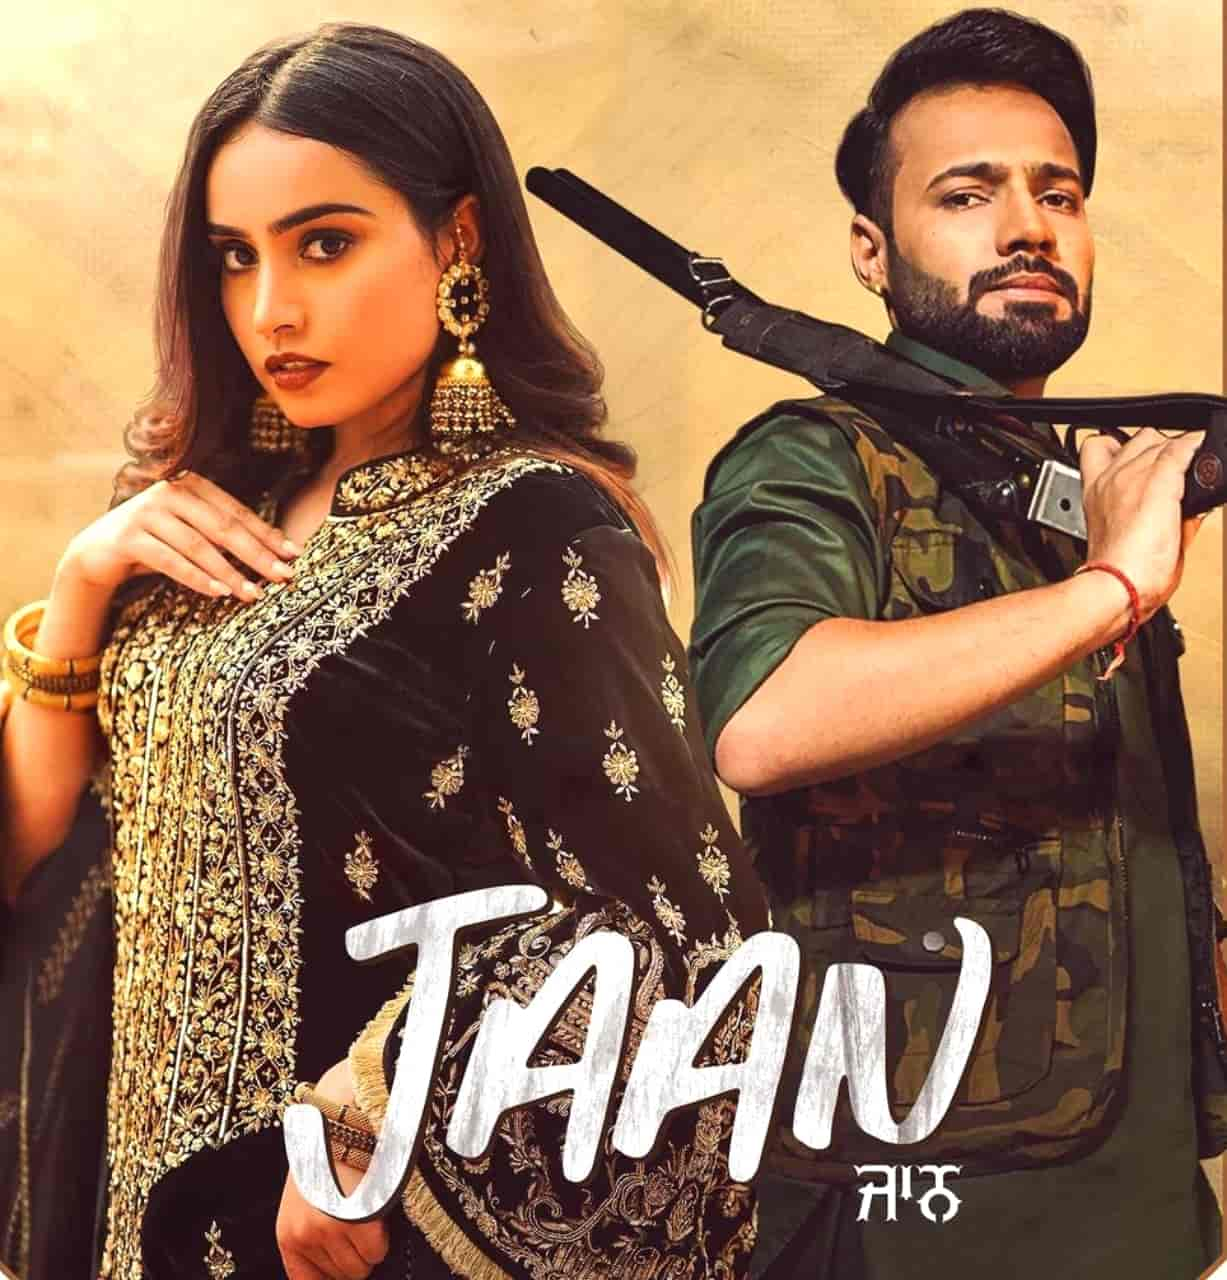 Jaan Punjabi Song Image Features Barbie Maan and Shree Brar